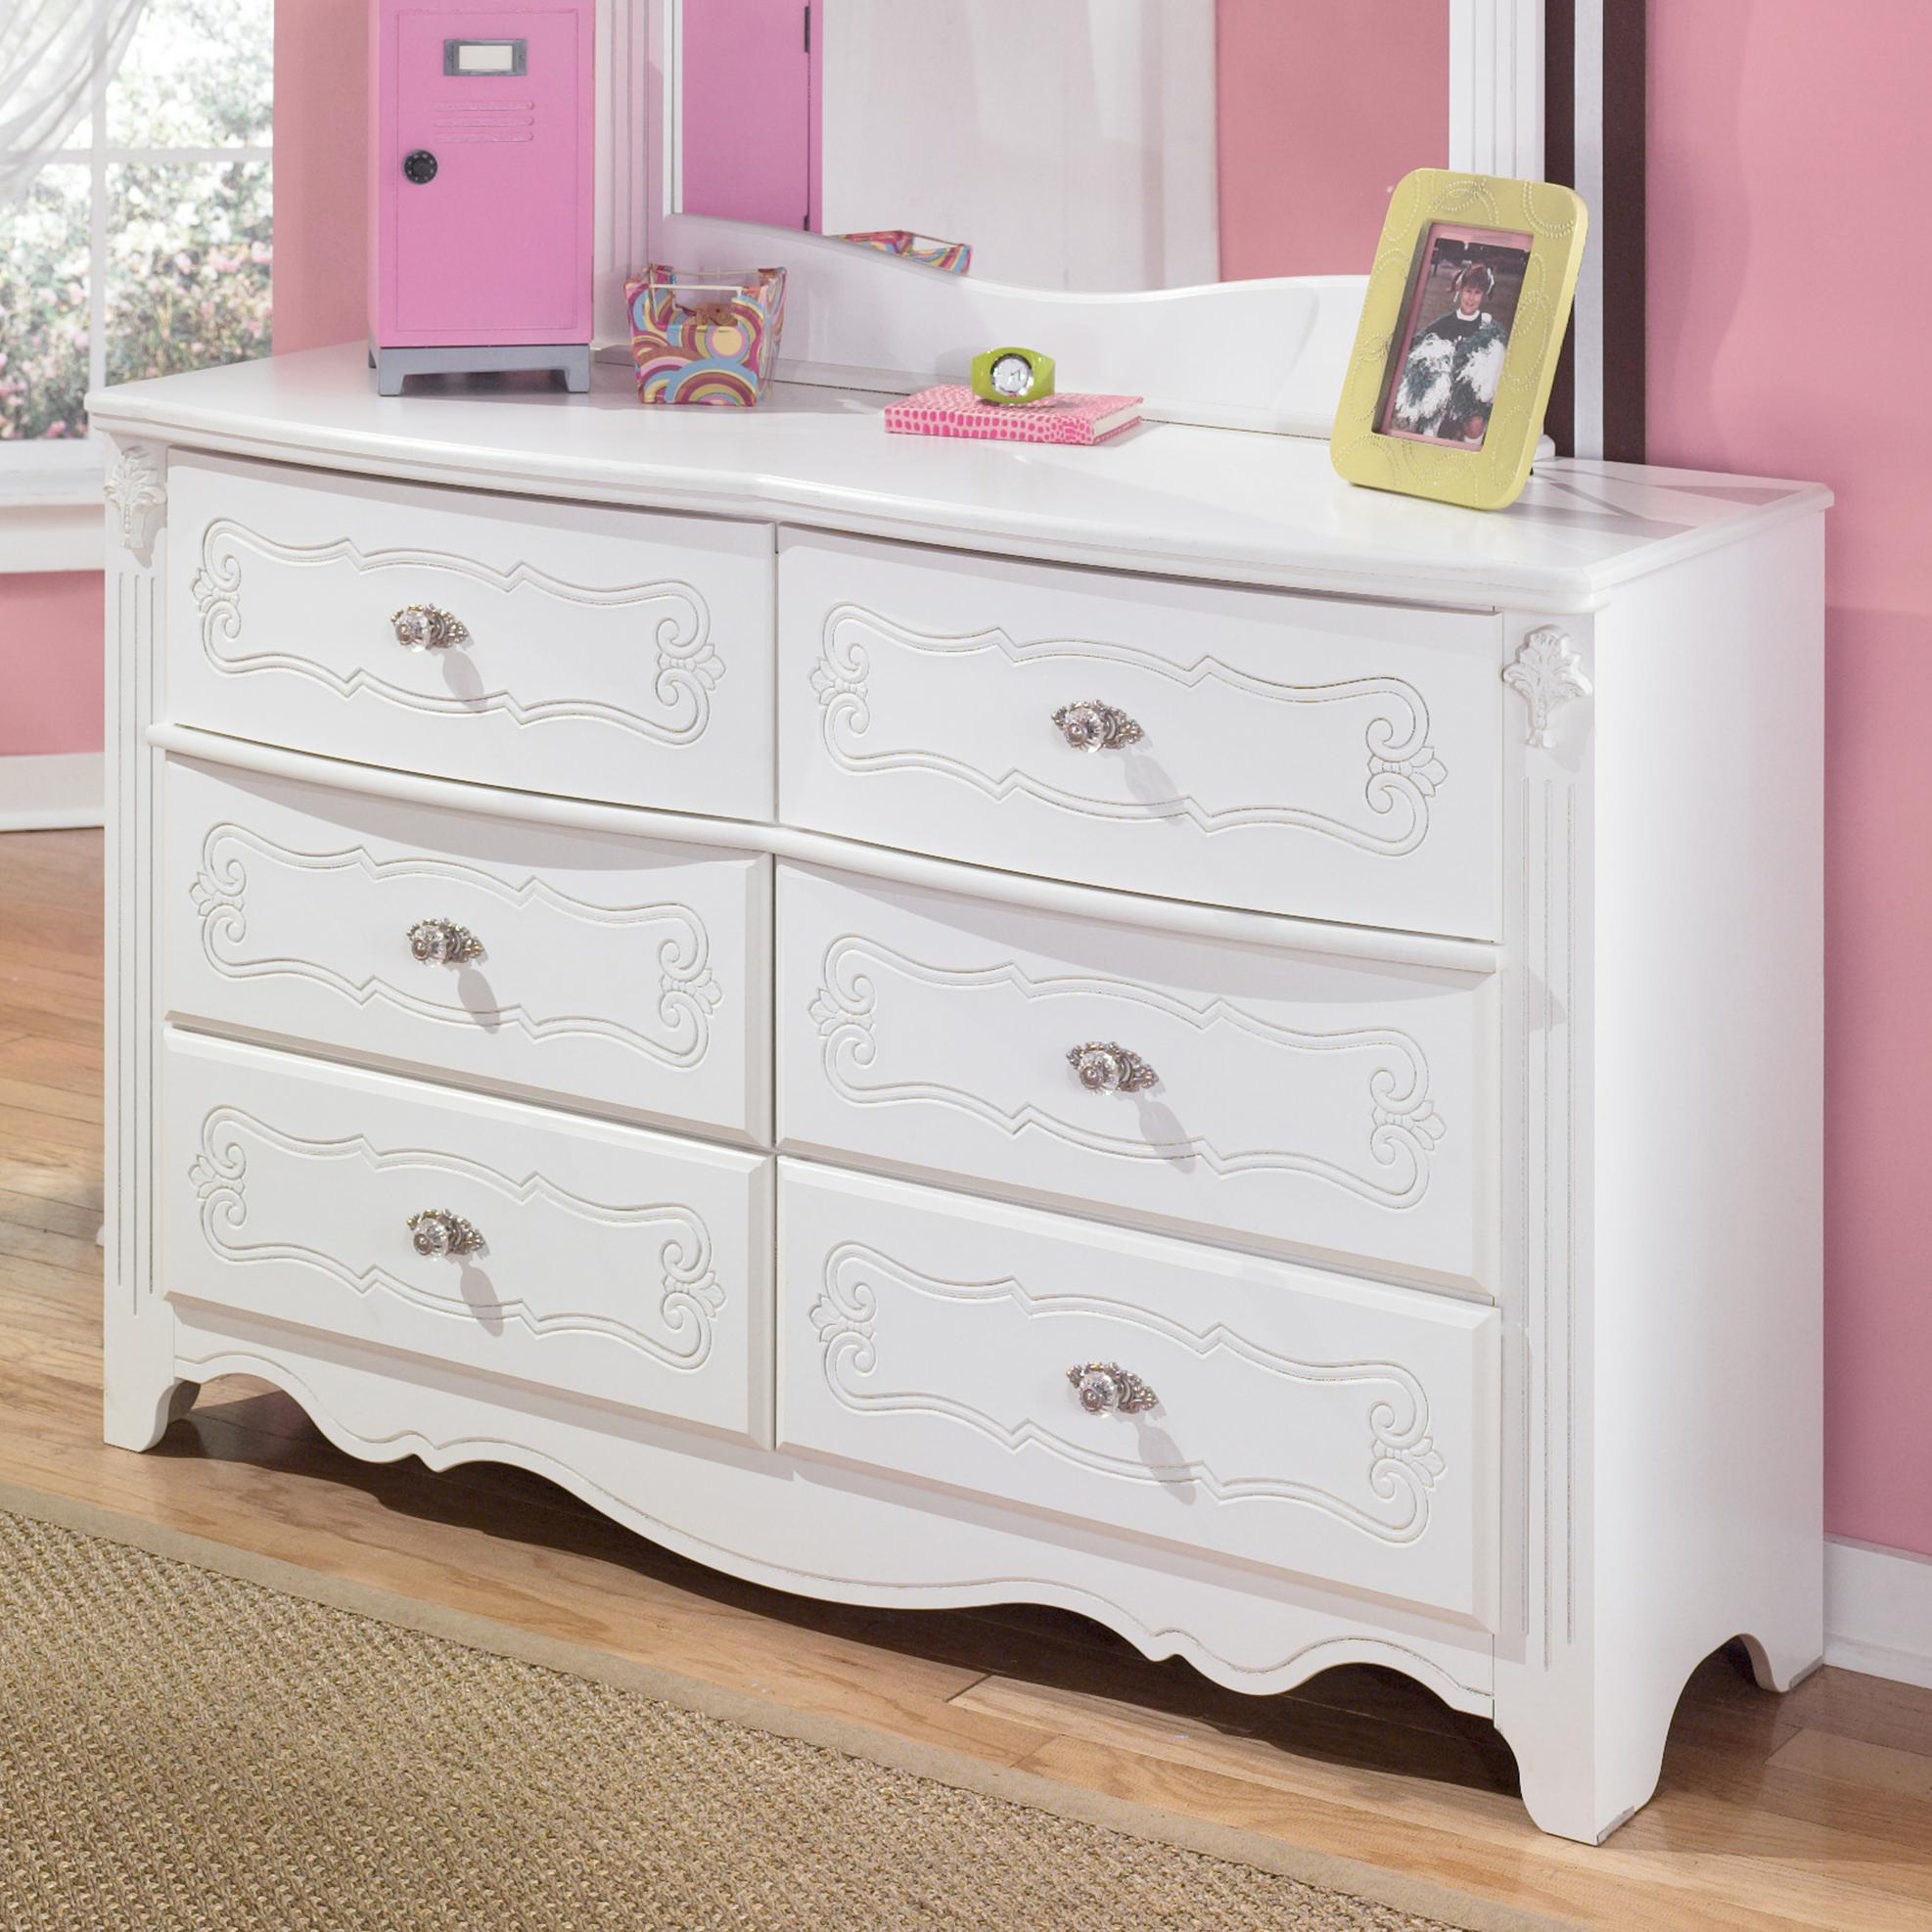 Signature Design By Ashley Exquisite B188 21 Traditional 6 Drawer Dresser John V Schultz